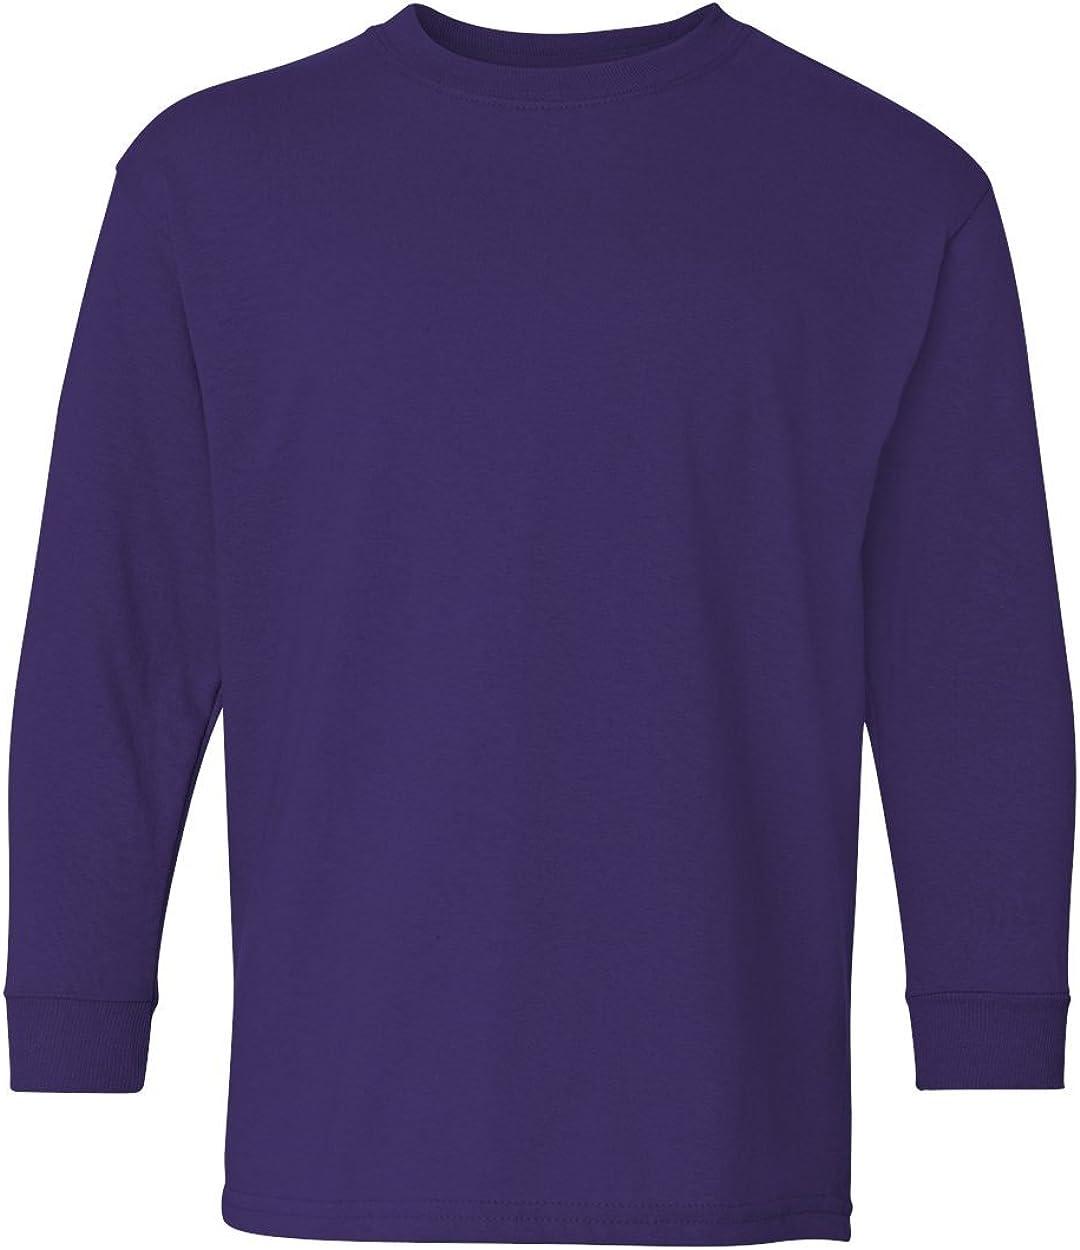 Heavy Cotton Long-Sleeve T-Shirt (G540B) Purple, S (Pack of 12)